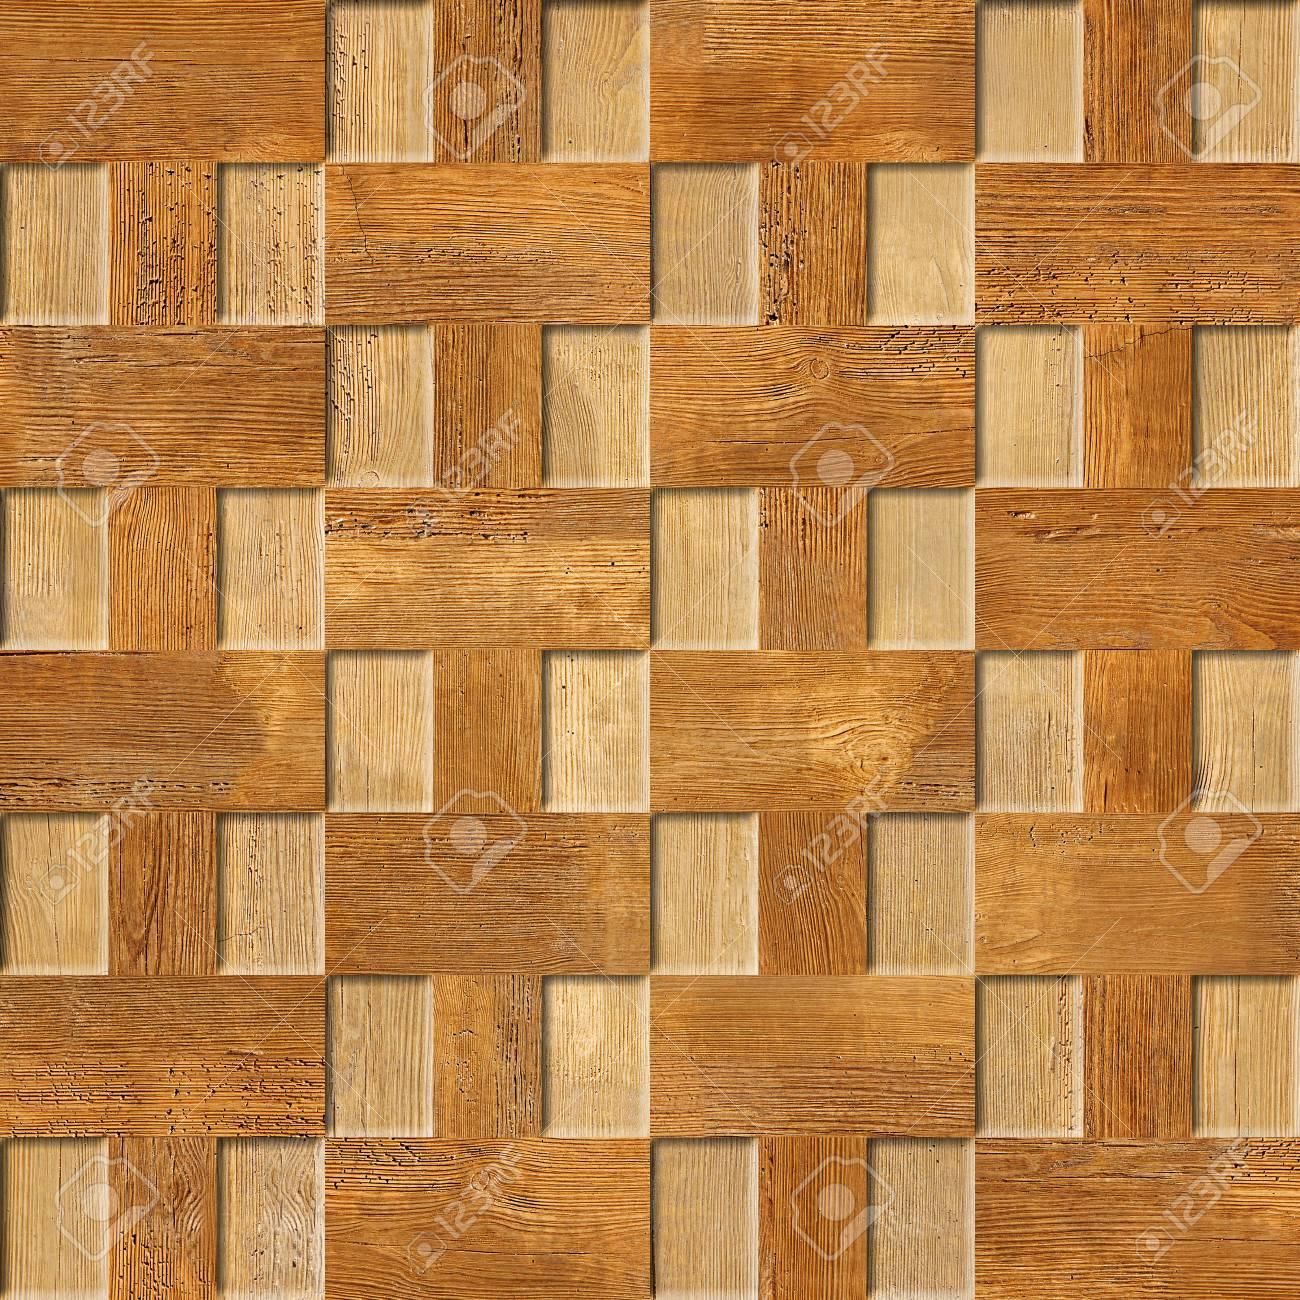 Interior Modelo De Panel De Pared Decorativos Patrón De Mosaico De Fondo Sin Fisuras Textura De Madera De Cerezo